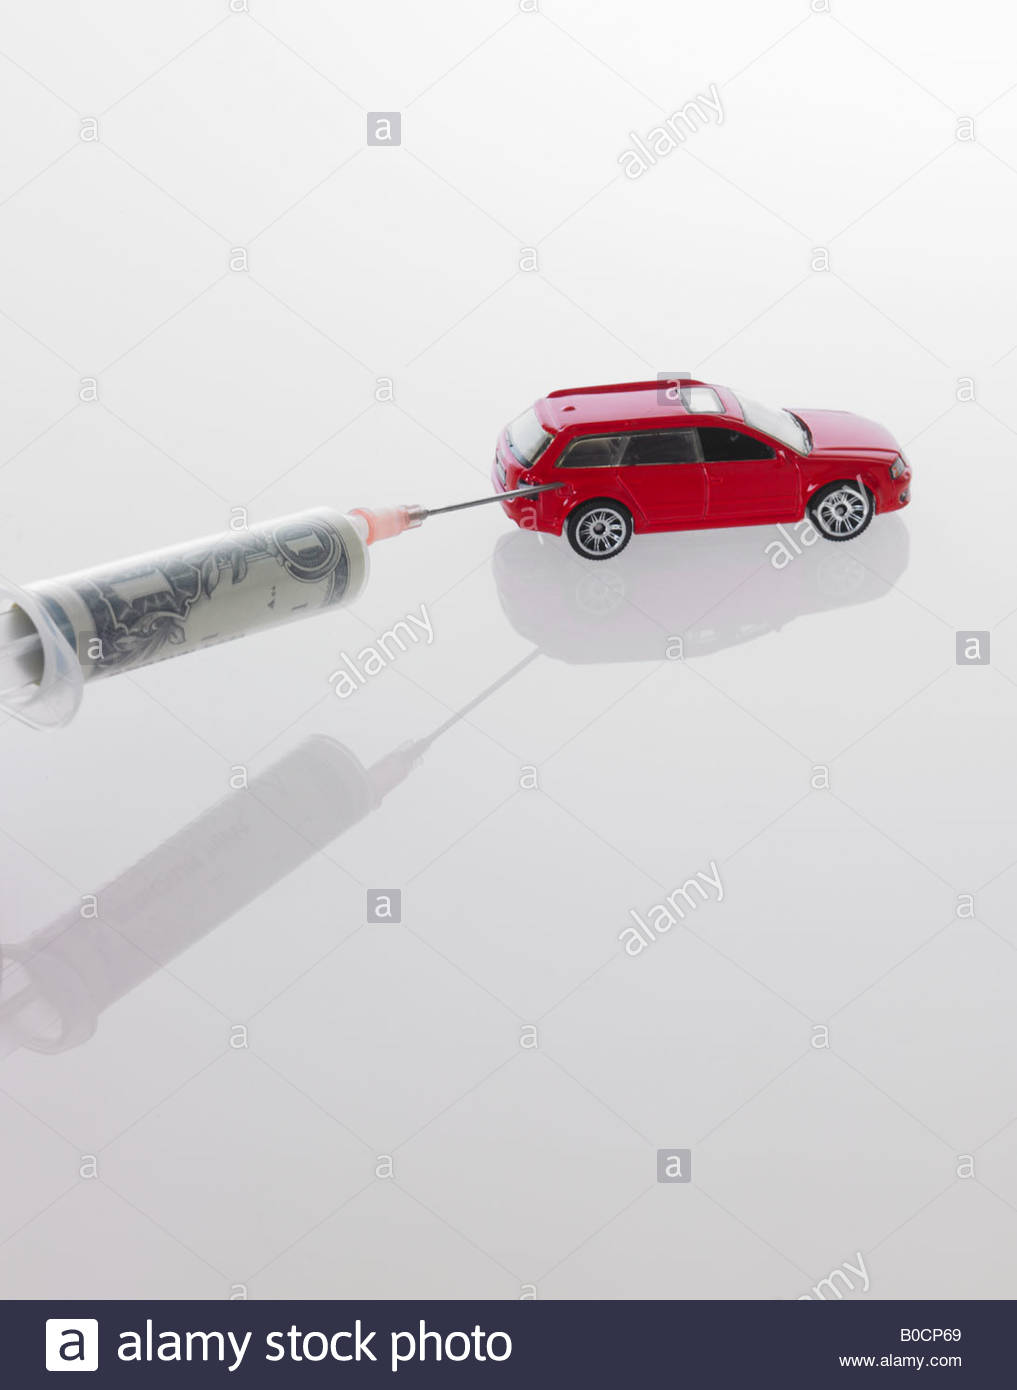 Fuel efficient toy car - Stock Image